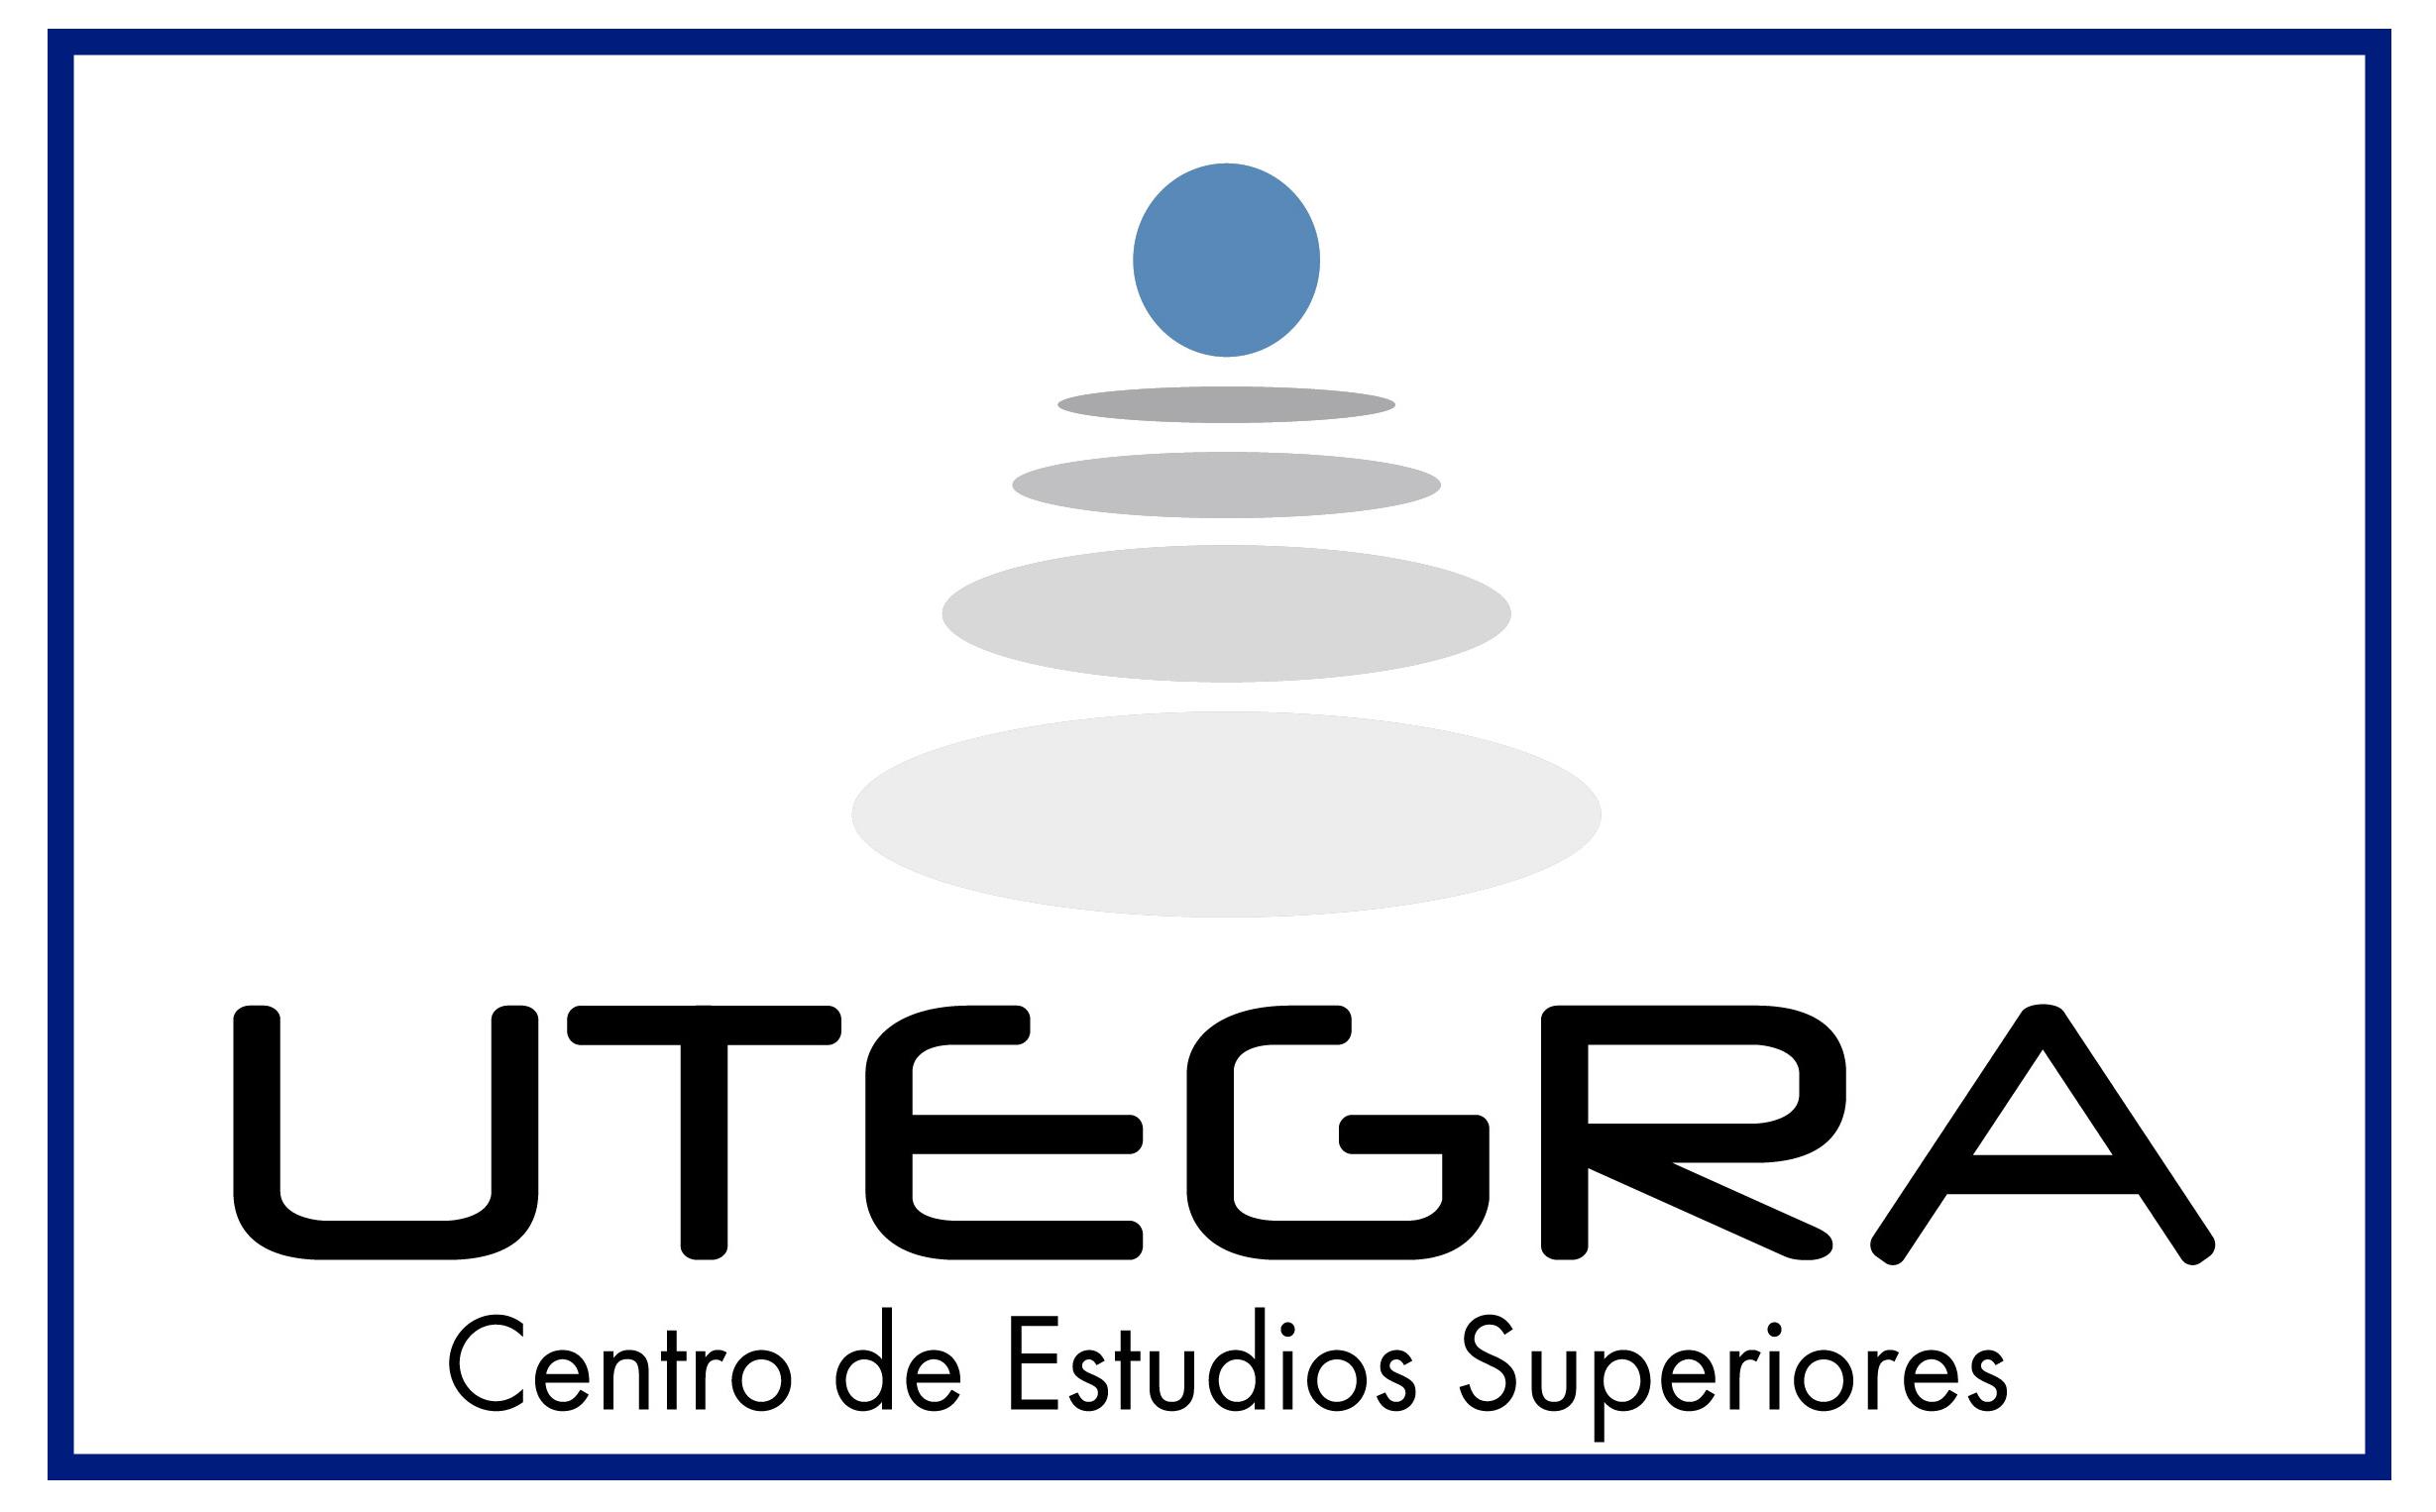 UTEGRA